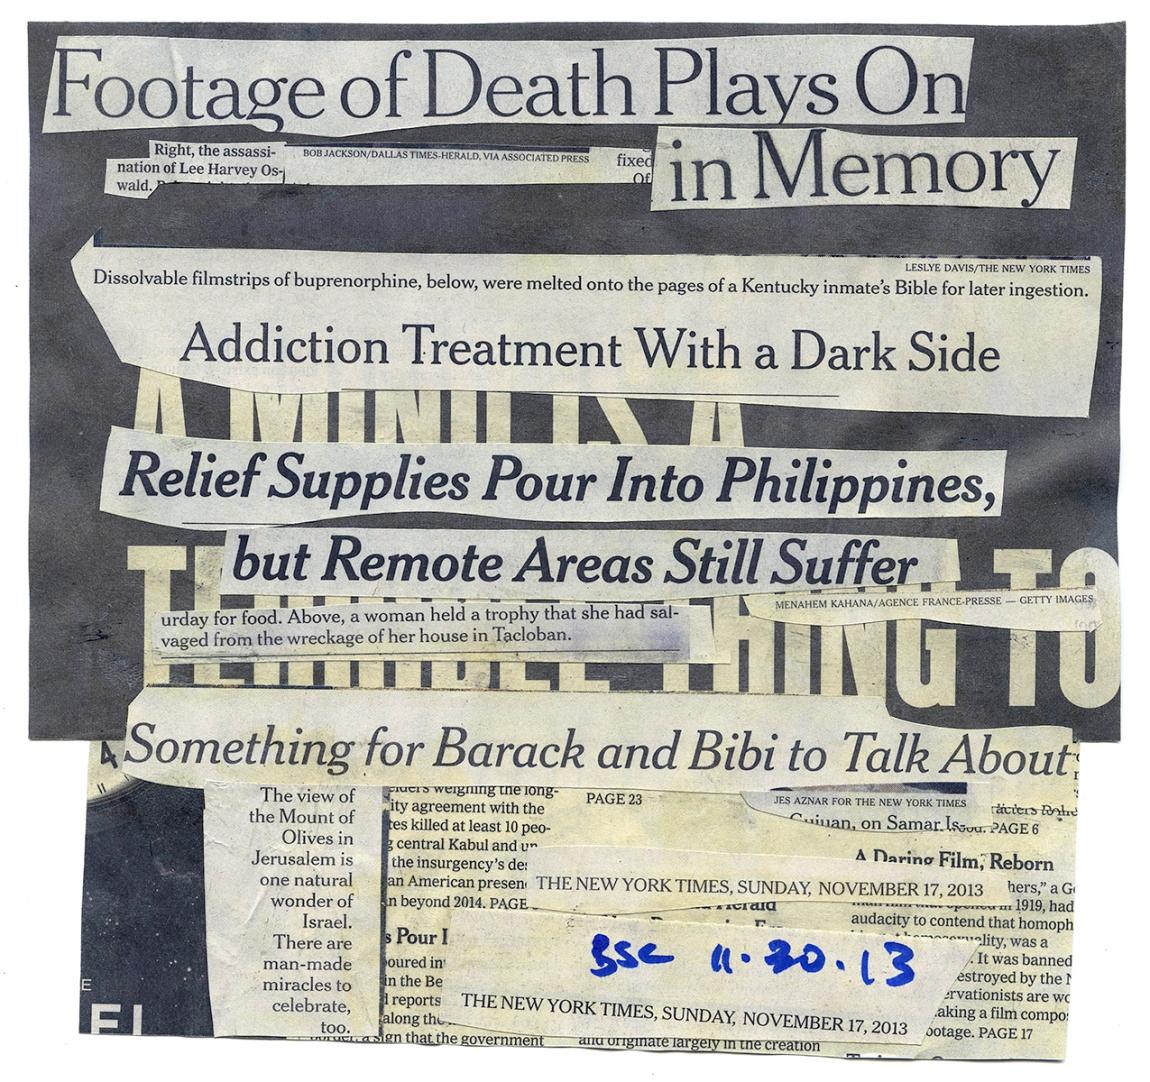 'TREATMENT WITH A DARK SIDE' NYT 11-17-13 - BSC 11-30-13b.jpg